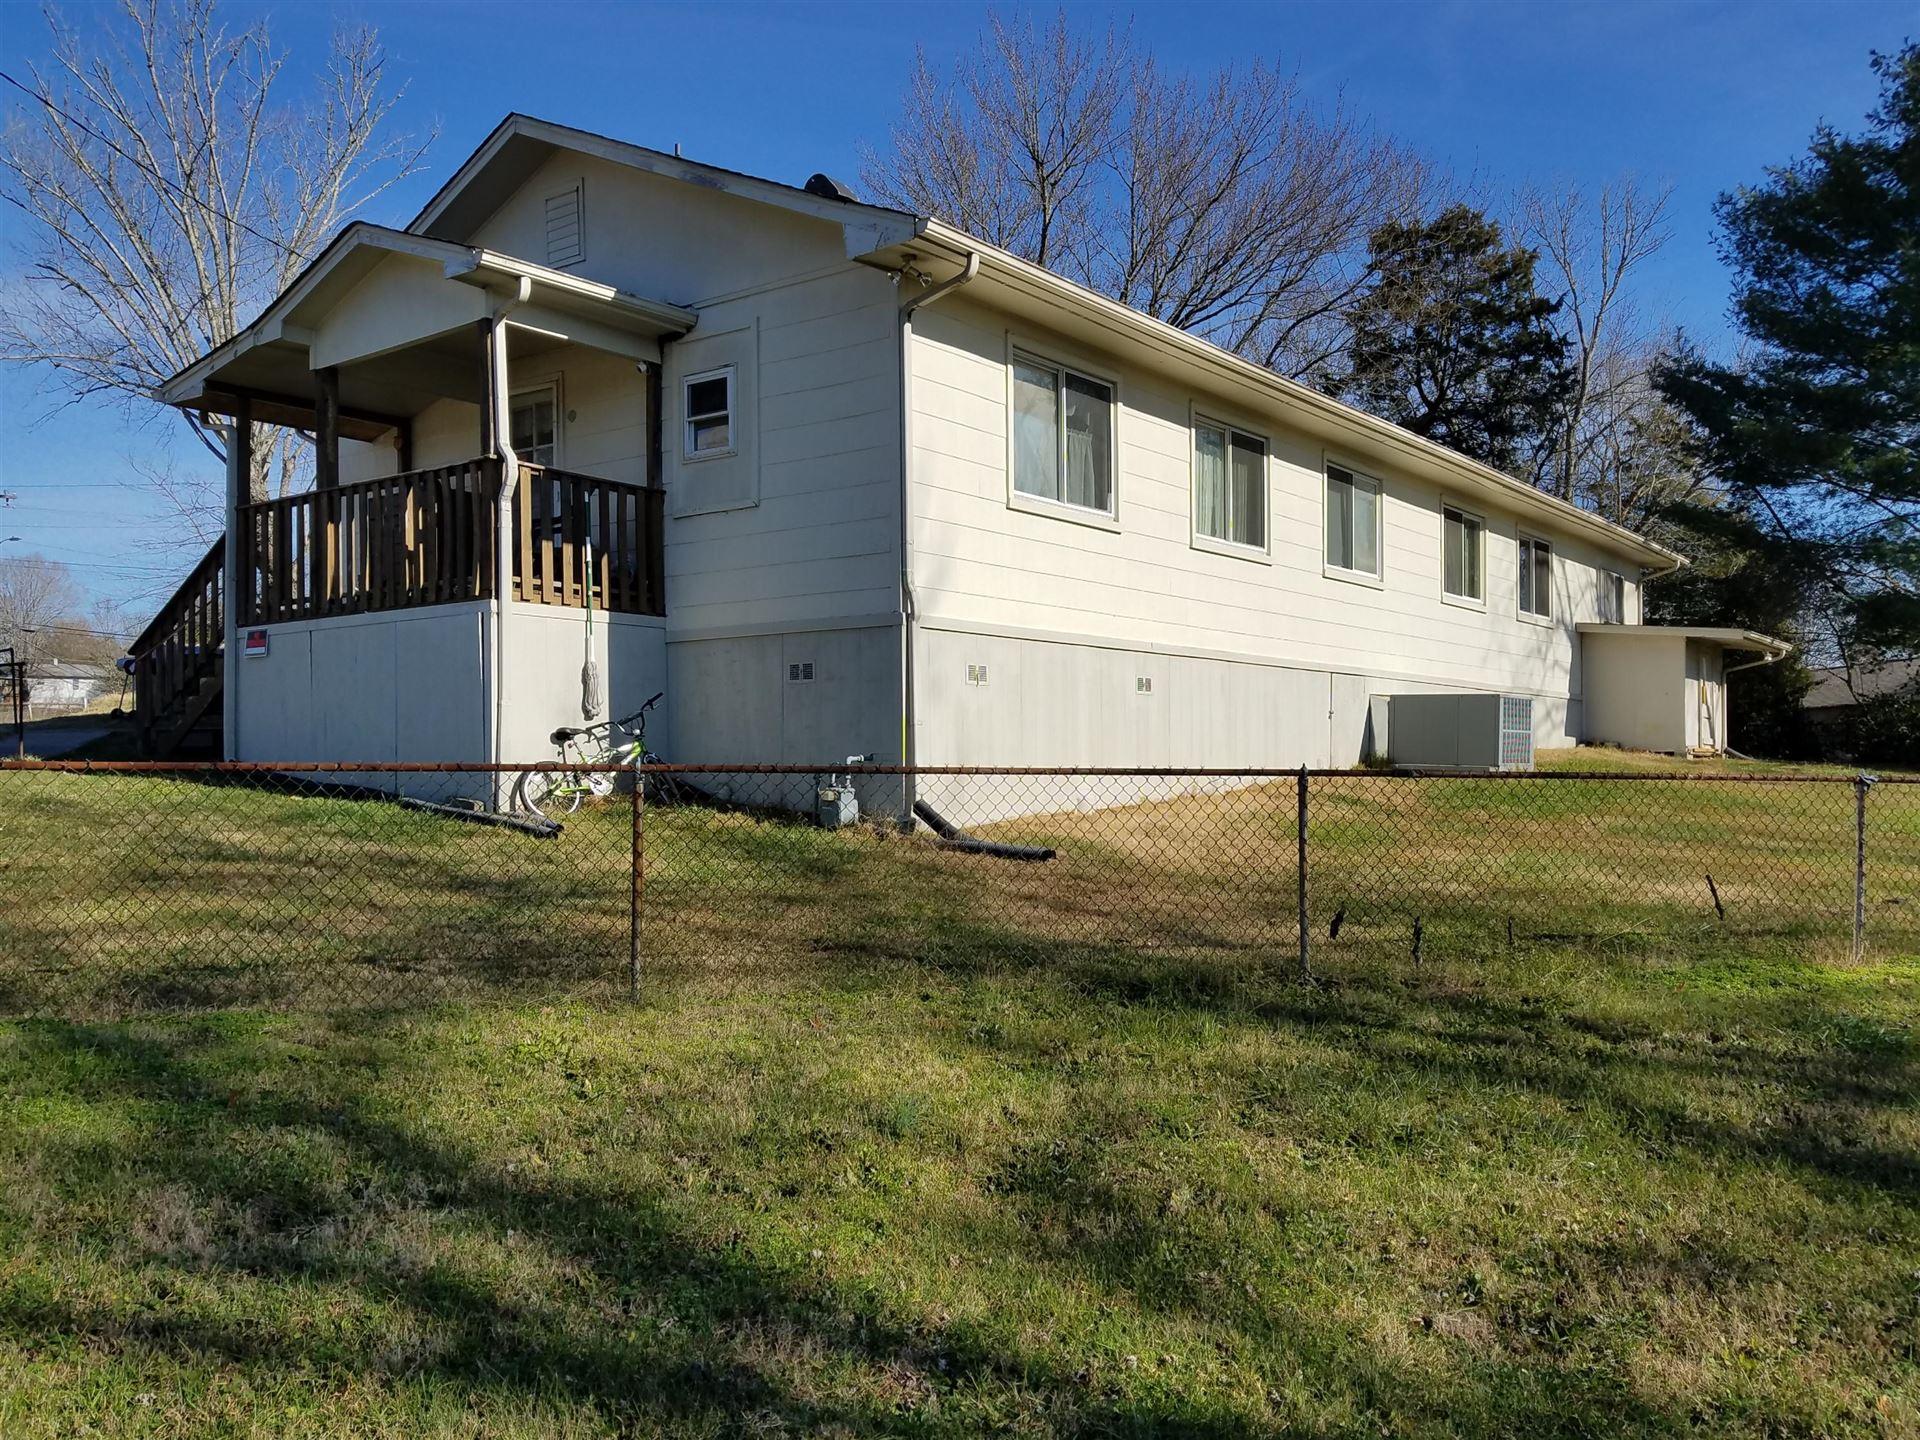 Photo of 613 W Outer Drive, Oak Ridge, TN 37830 (MLS # 1138603)